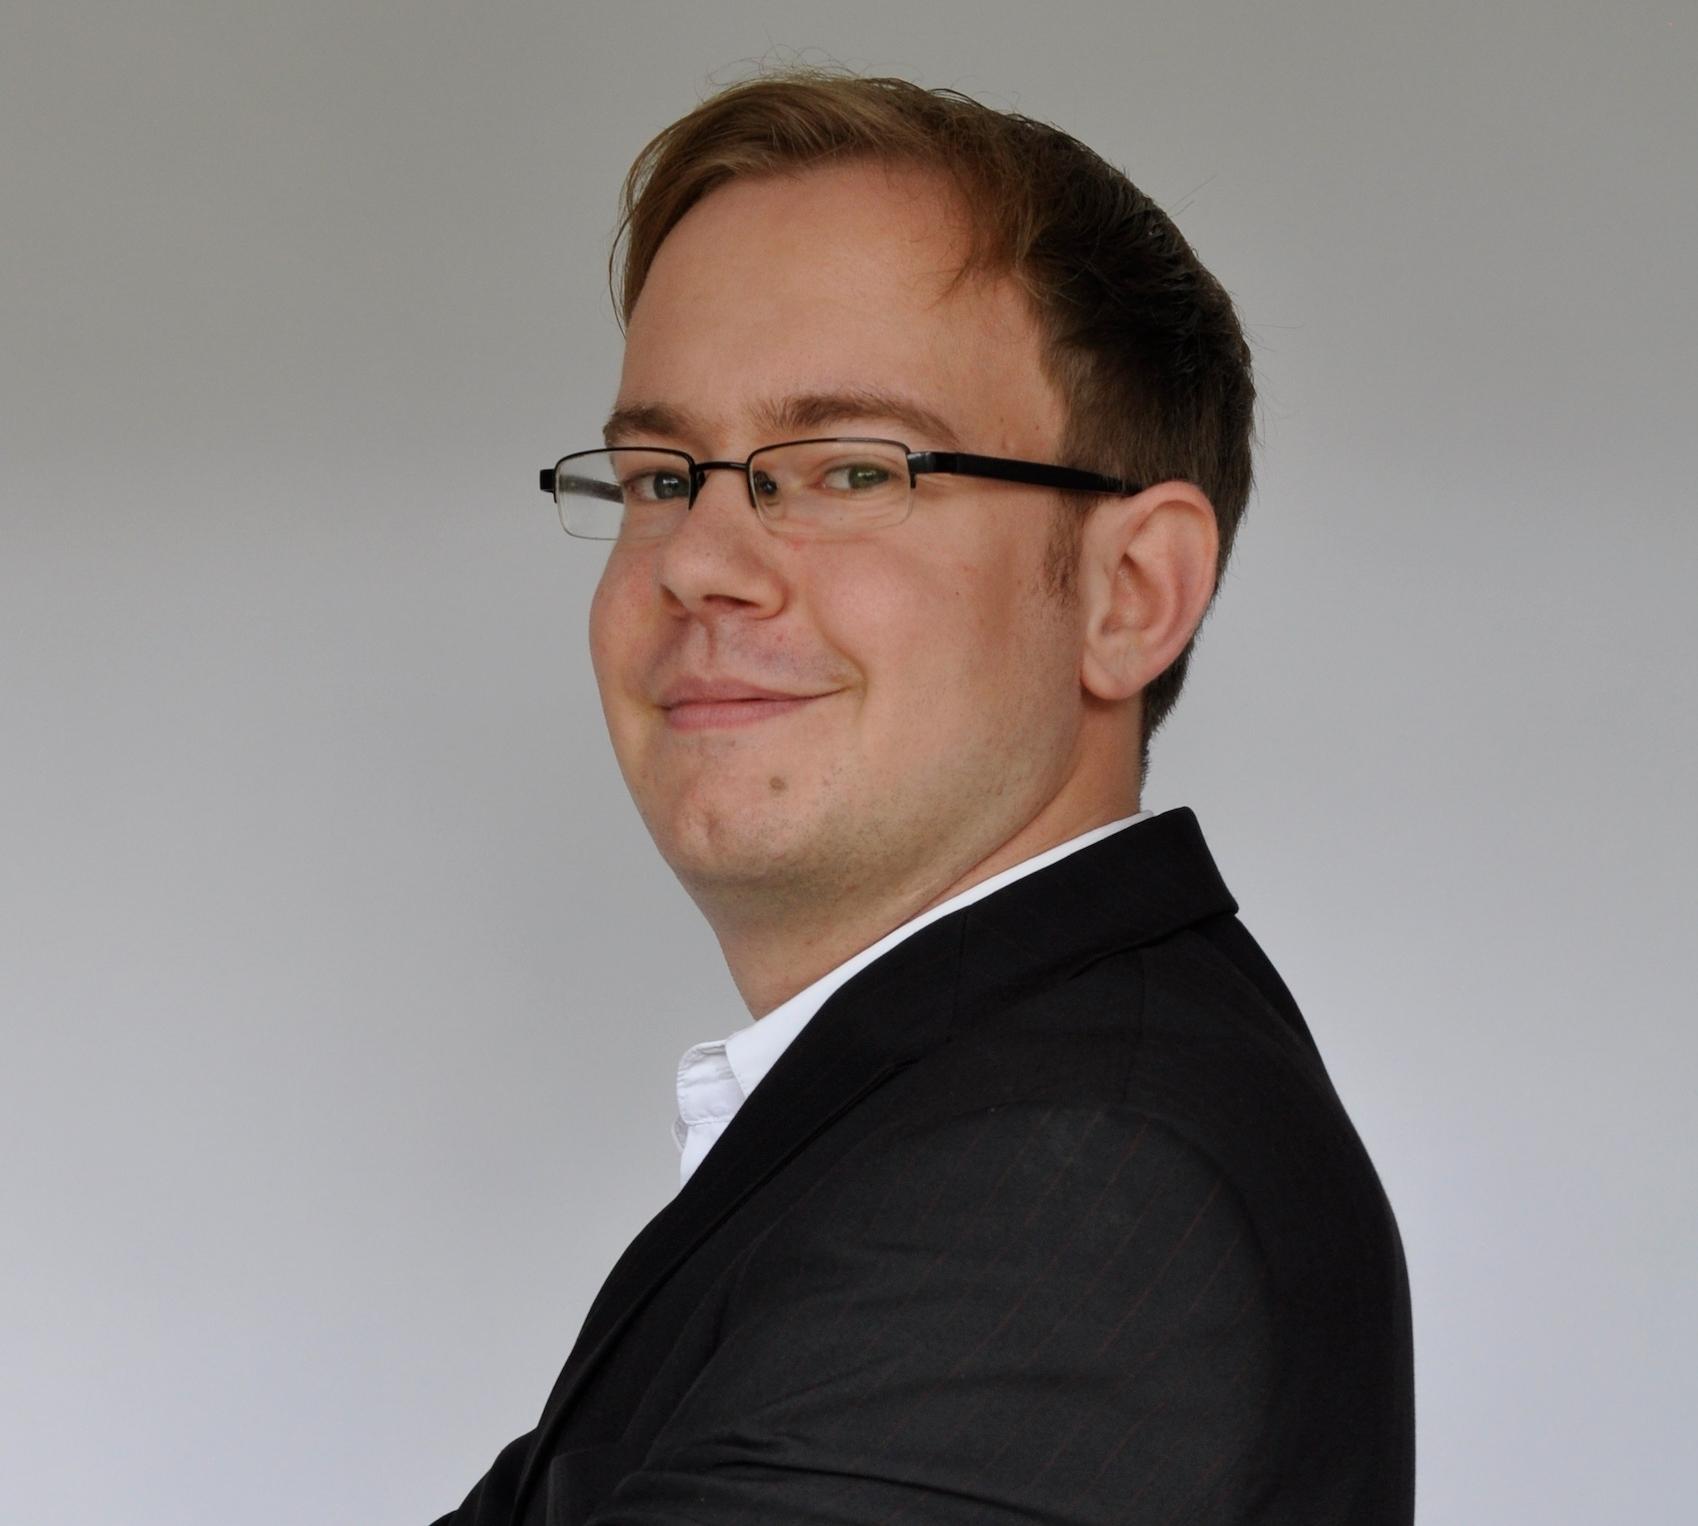 Alexander Mildenberger - Managing the OfficeEmail an Alexander MildenbergerTel. +49 176 72 90 7671